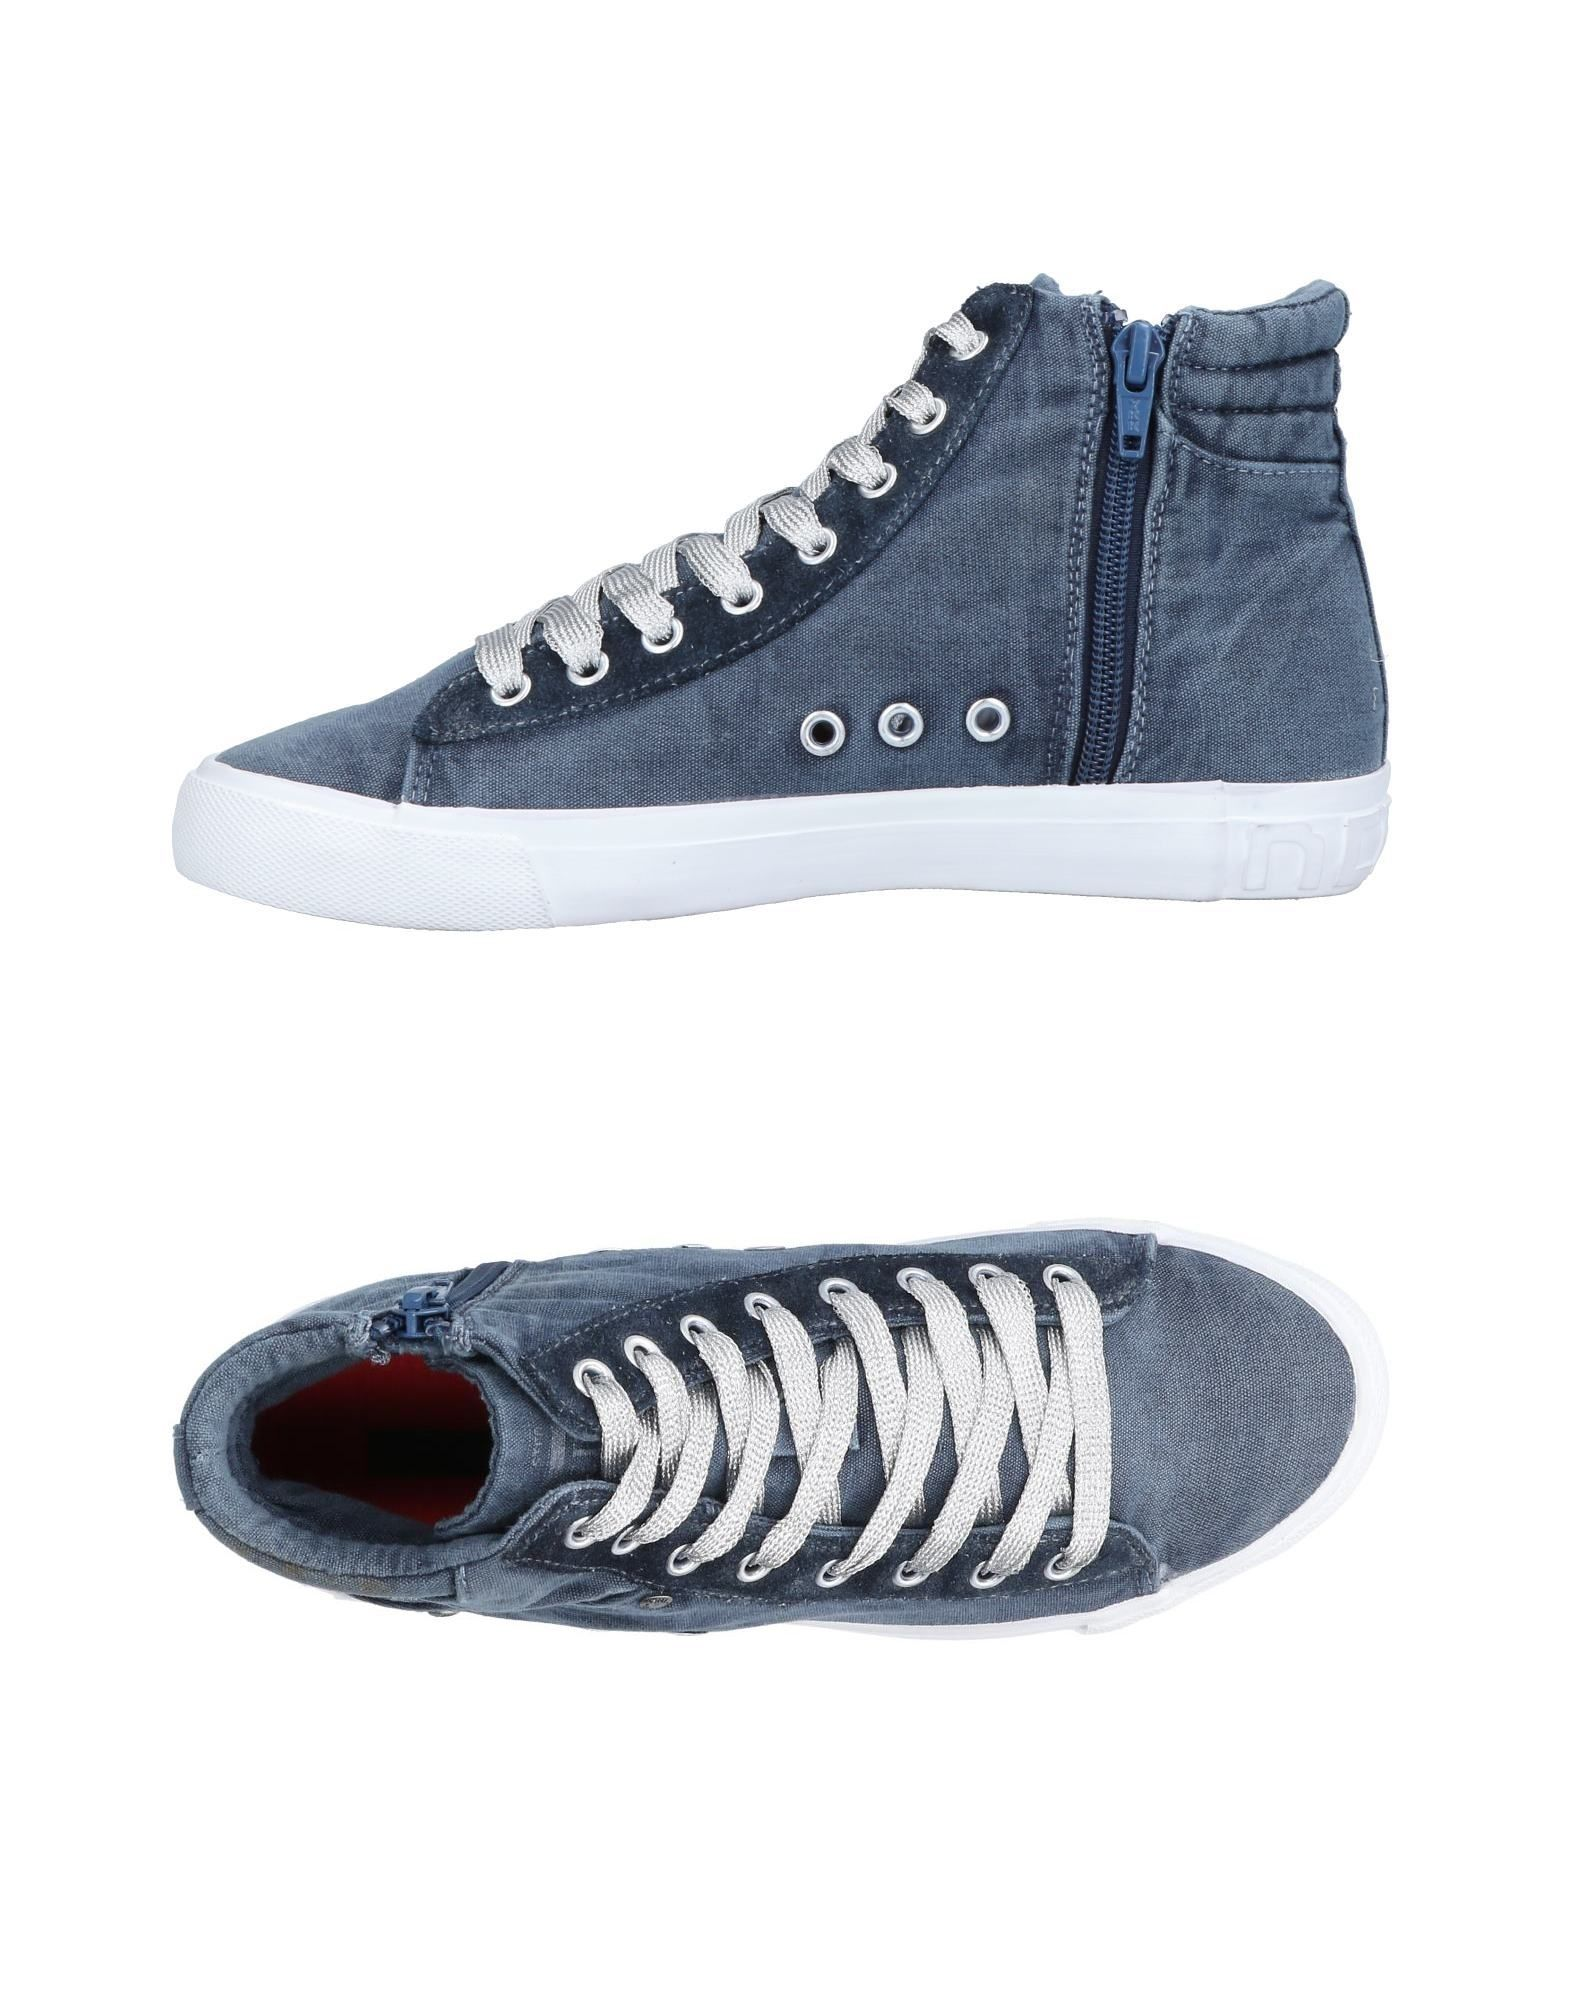 873f7248cee REPLAY ΠΑΠΟΥΤΣΙΑ Χαμηλά sneakers, Γυναικεία sneakers, ΓΥΝΑΙΚΑ ...